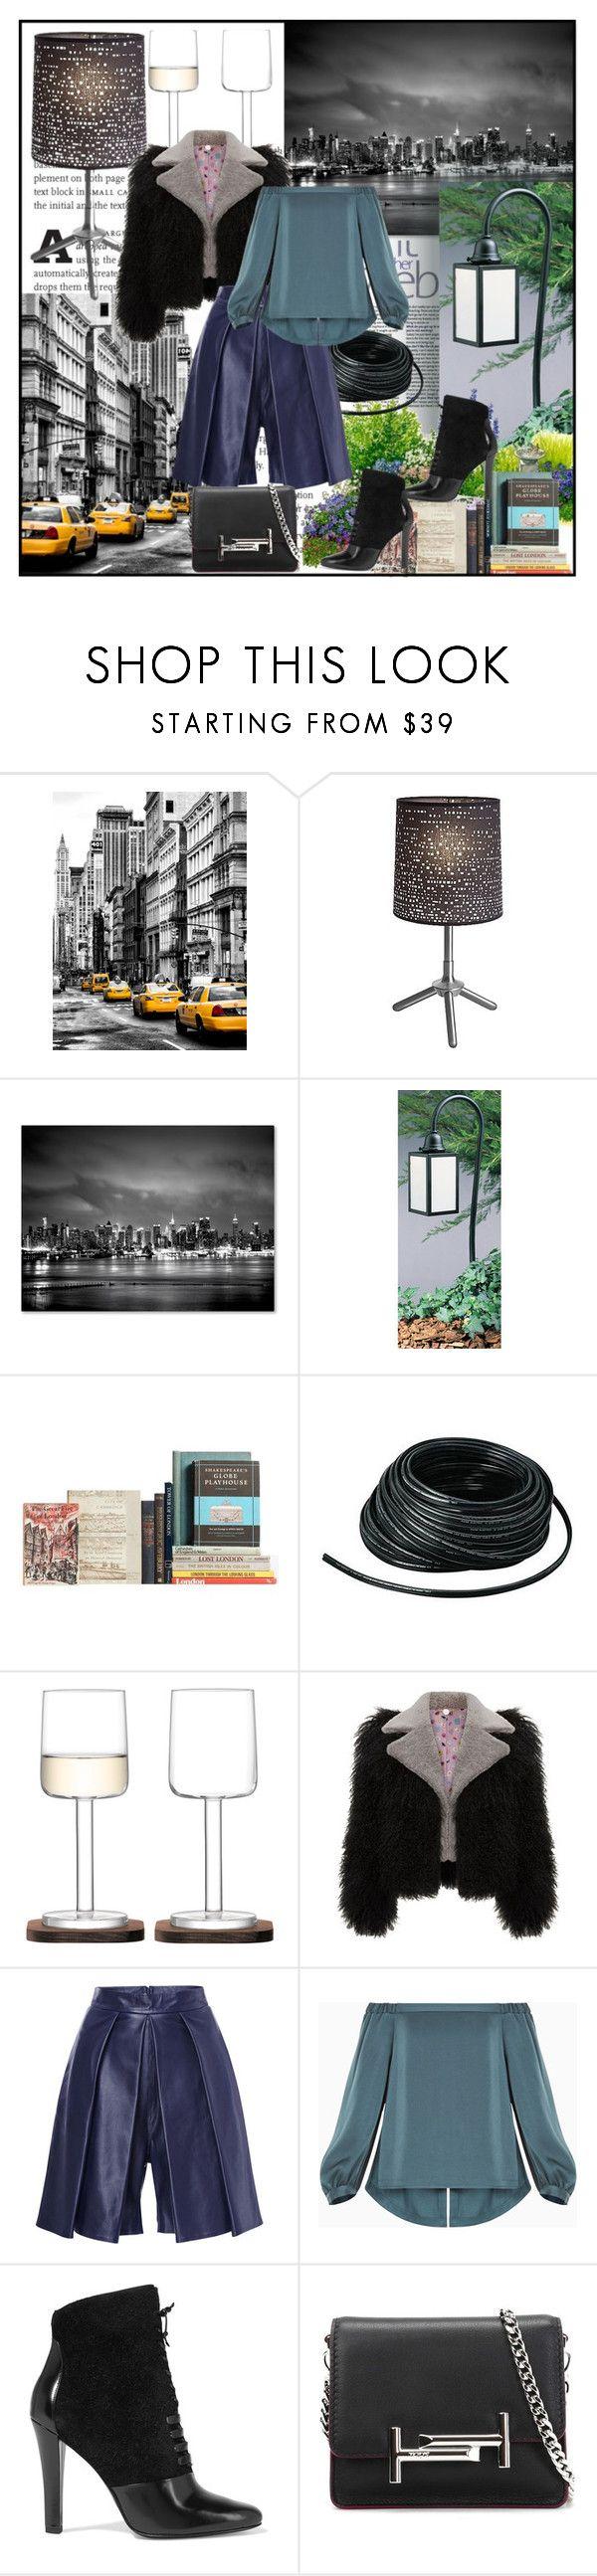 """City Landscape"" by din-sesantadue ❤ liked on Polyvore featuring Trademark Fine Art, Arroyo Craftsman, WAC Lighting, LSA International, BCBGMAXAZRIA, 3.1 Phillip Lim and Tod's"